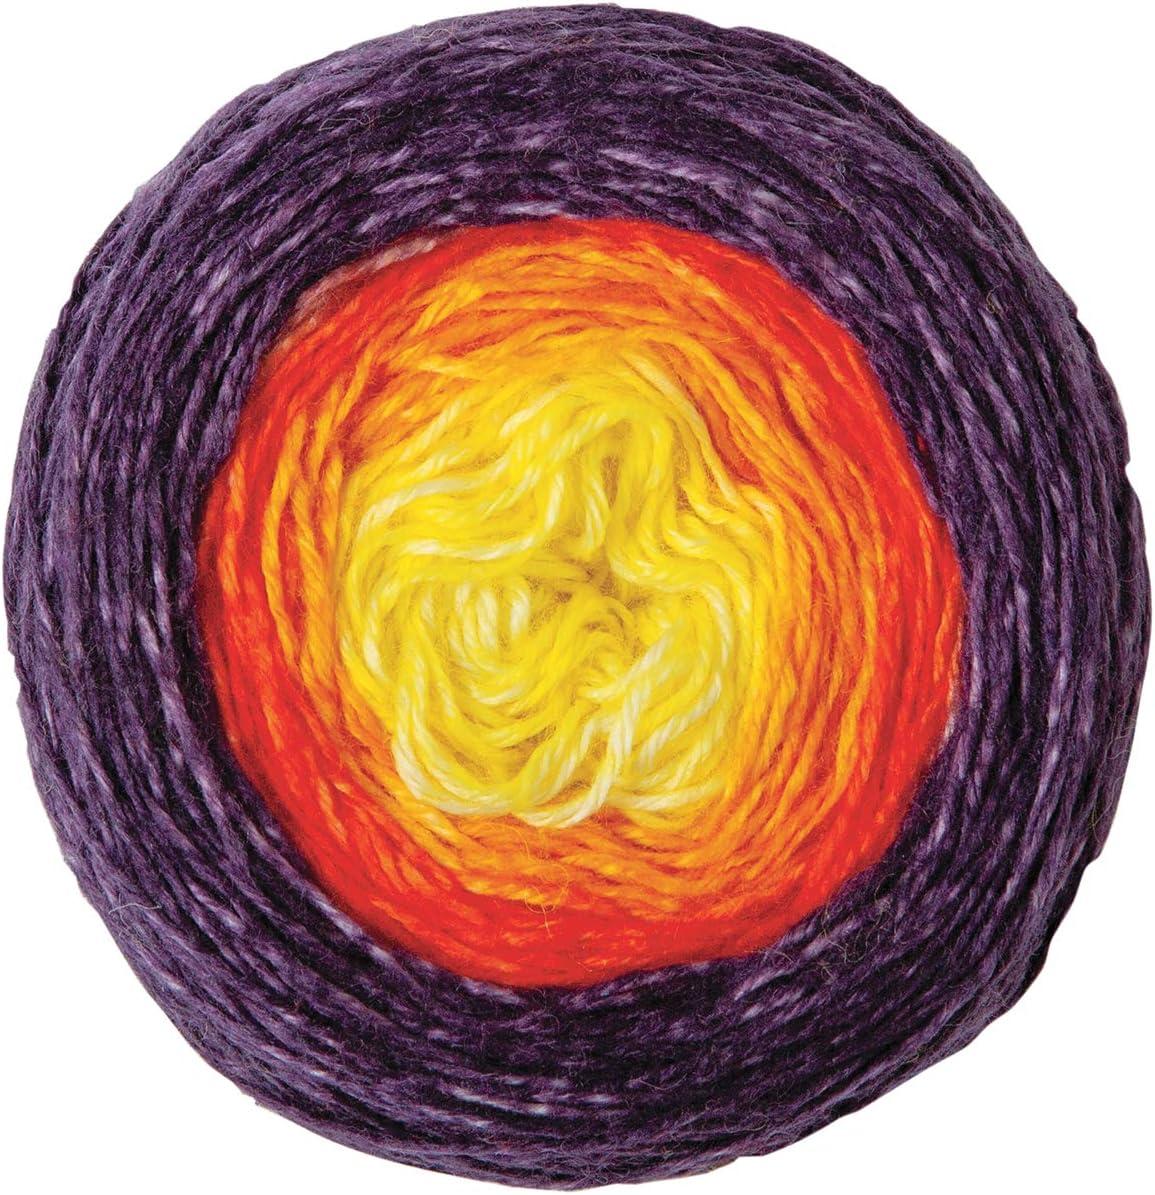 Knit Picks Stroll Gradient Superwash Merino Wool Fingering Weight Yarn - 100 Gram Cake (Dragon Breath)